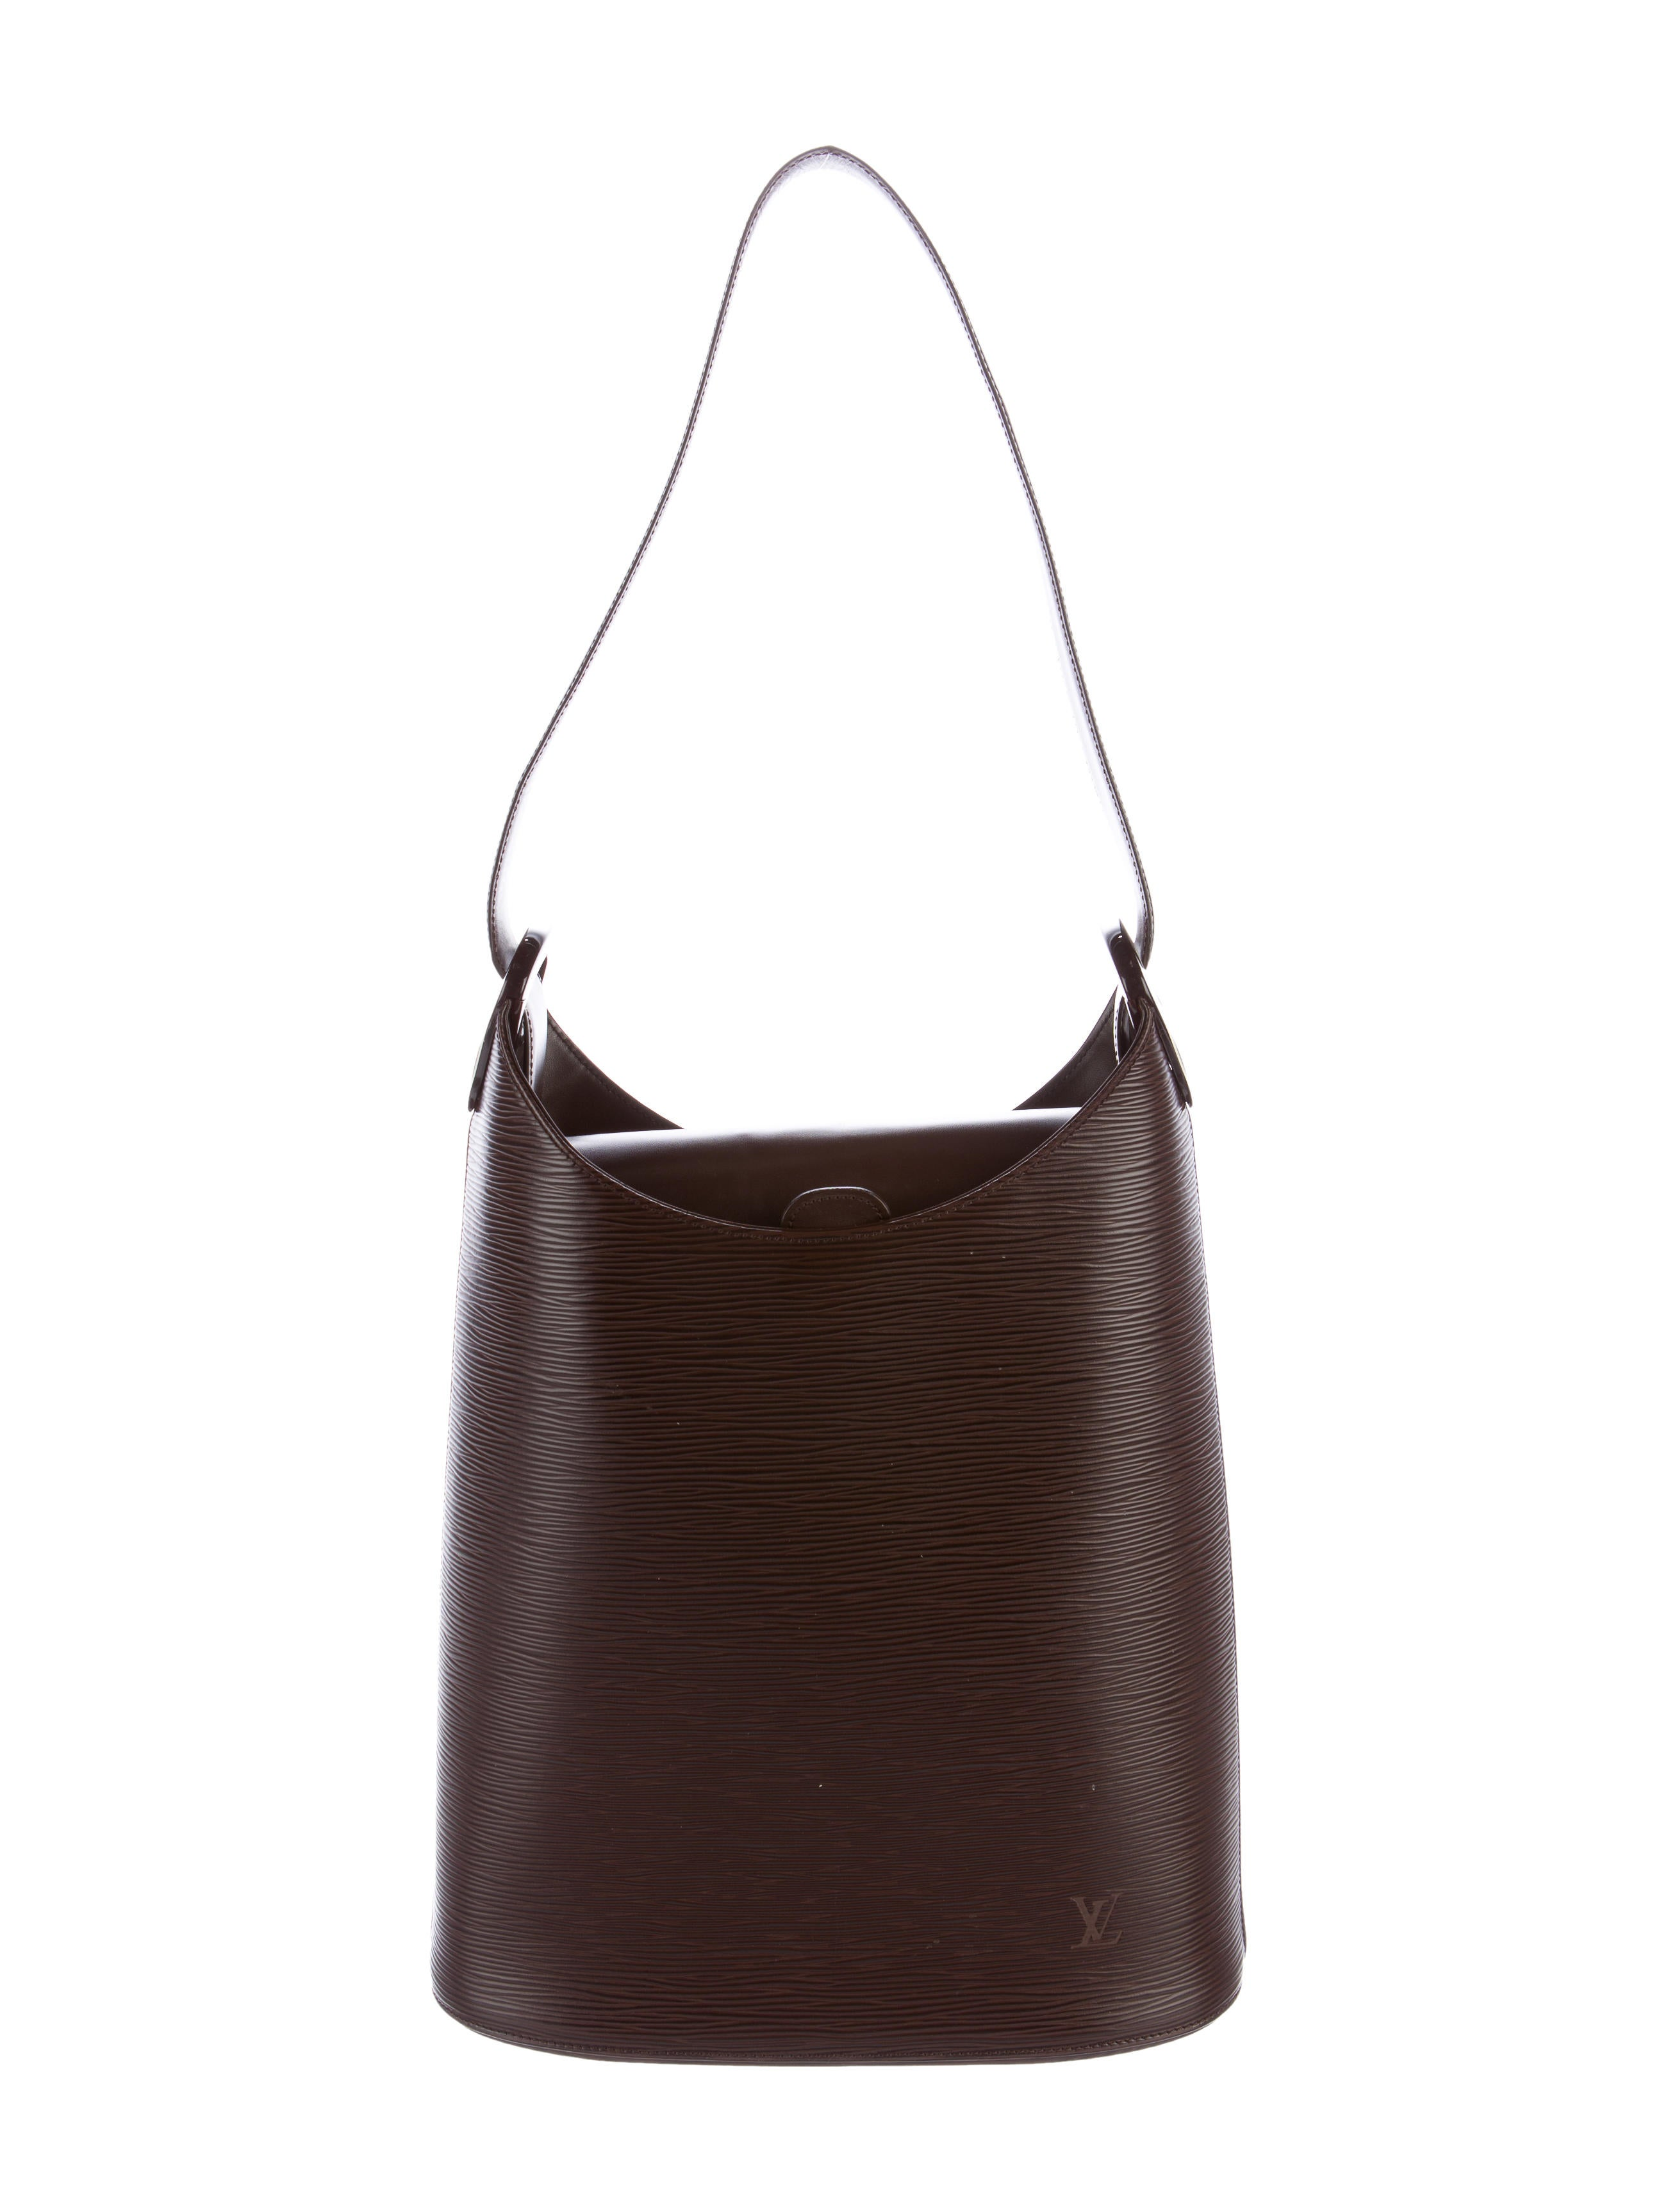 Sac Louis Vuitton Vrai : Louis vuitton epi sac verseau handbags lou the